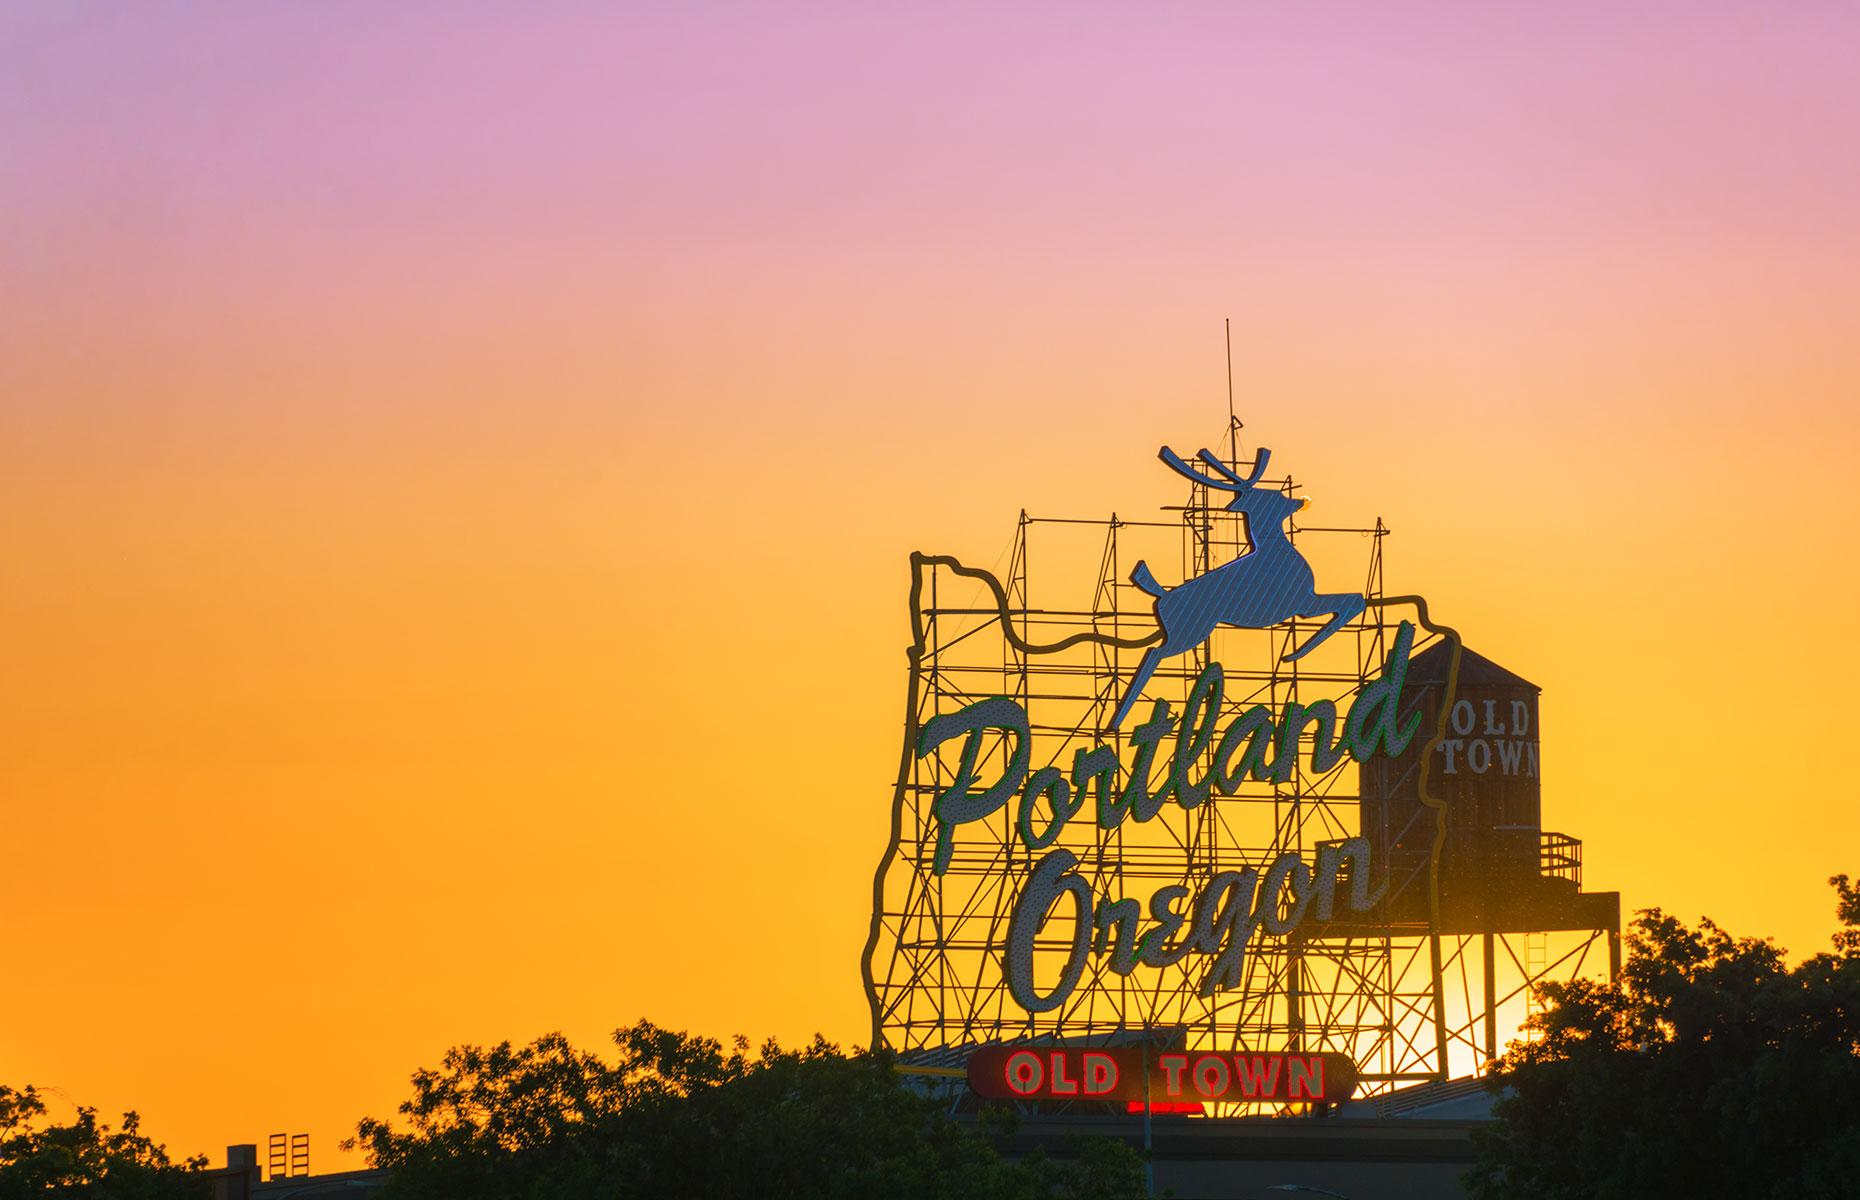 Portland, Oregon's famous White Stag Sign (Image: Jess Kraft/Shutterstock)